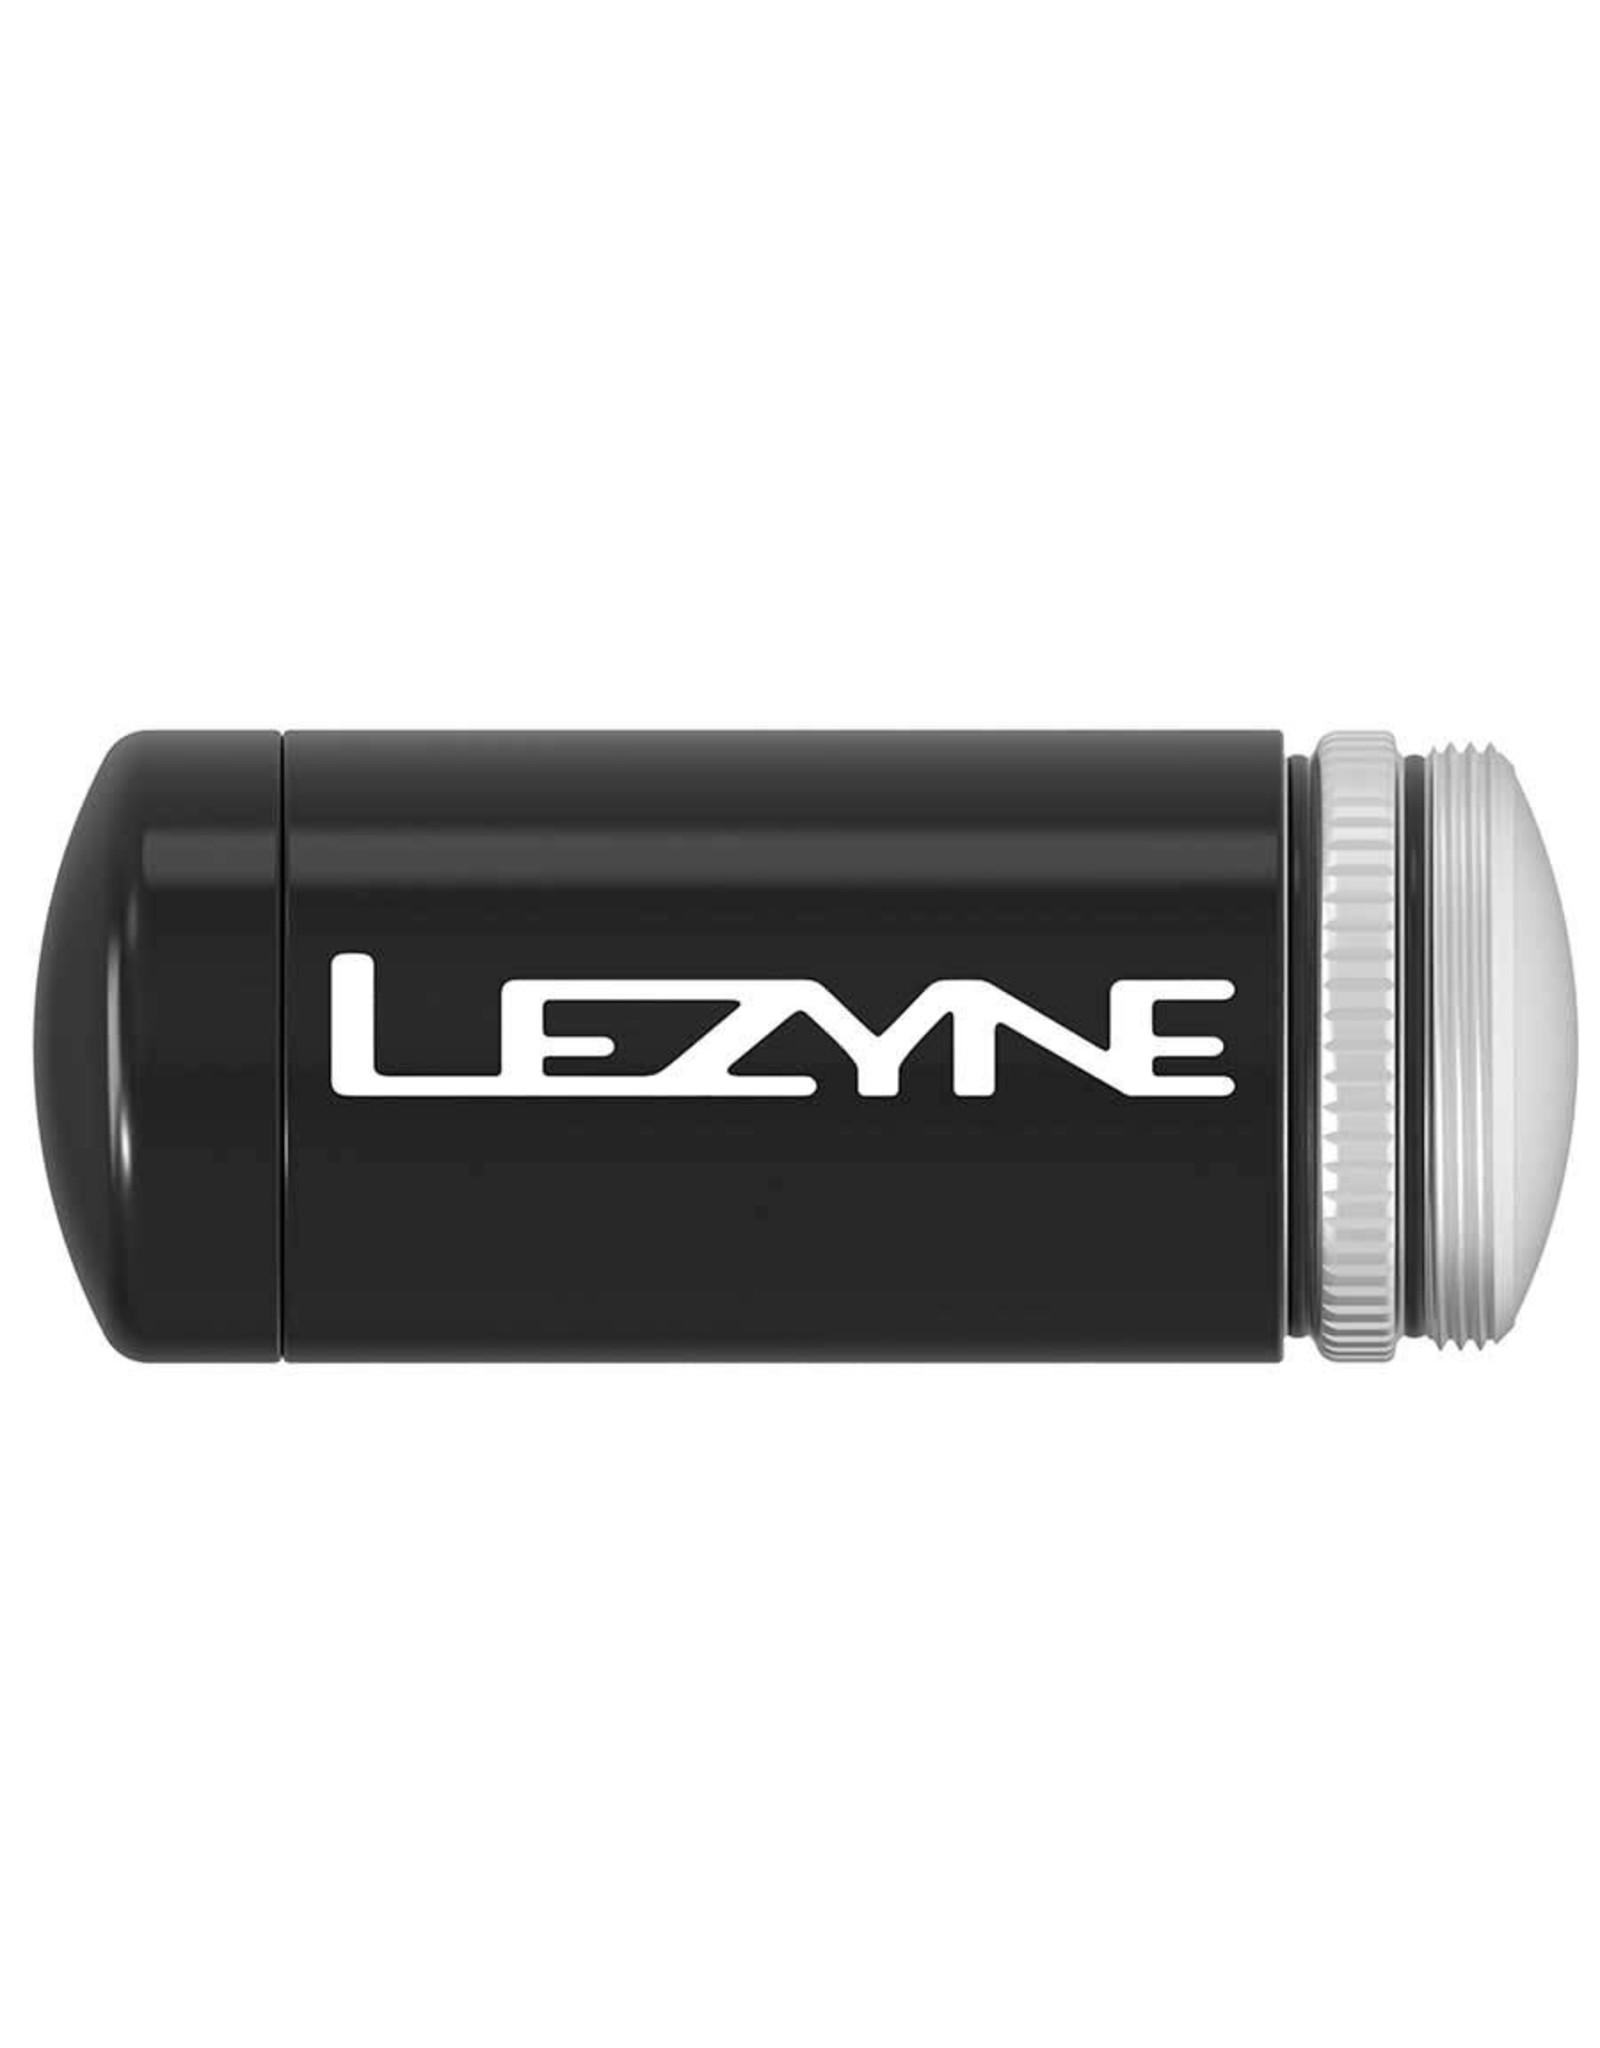 Lezyne Kit réparation tubeless Lezyne inclus outil alu et 5 plugs